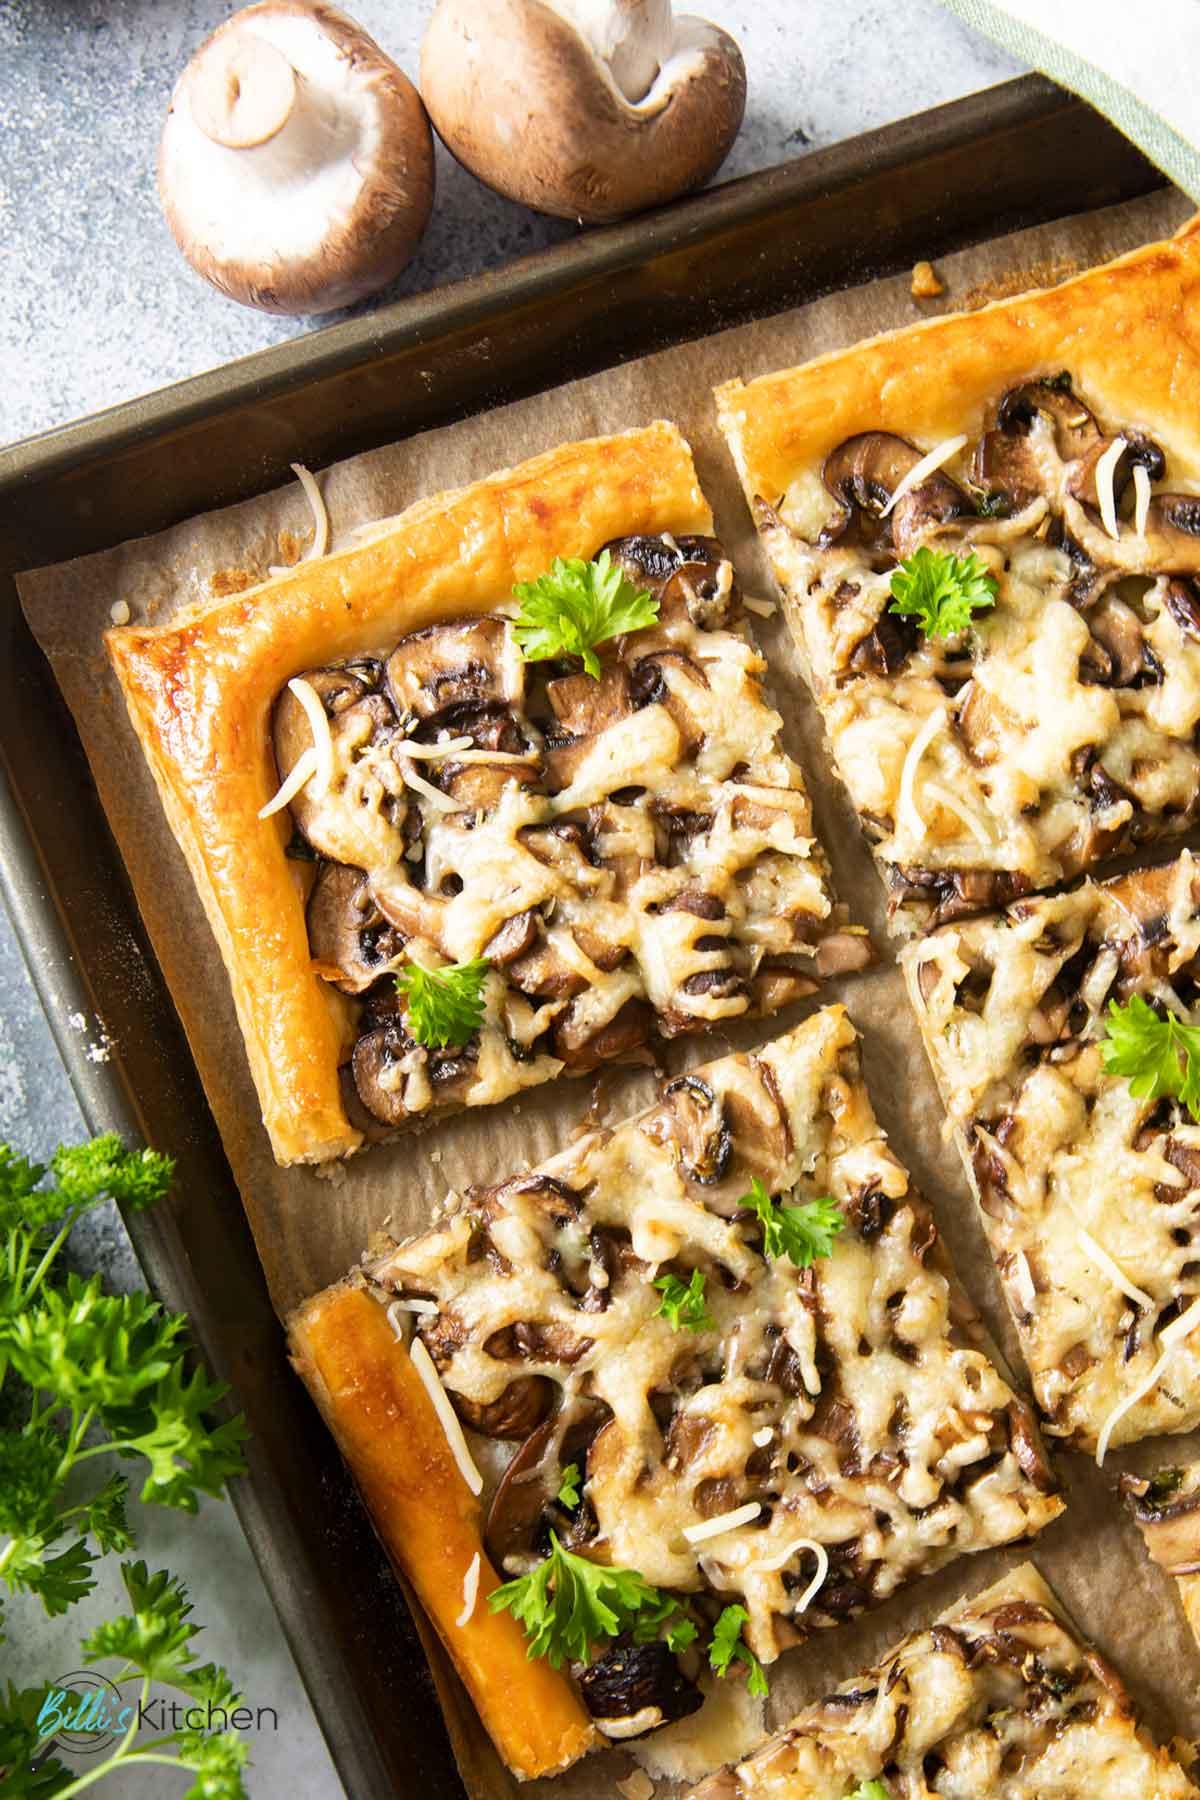 An overhead shot of slices of mushroom tart, with fresh mushrooms on the side.